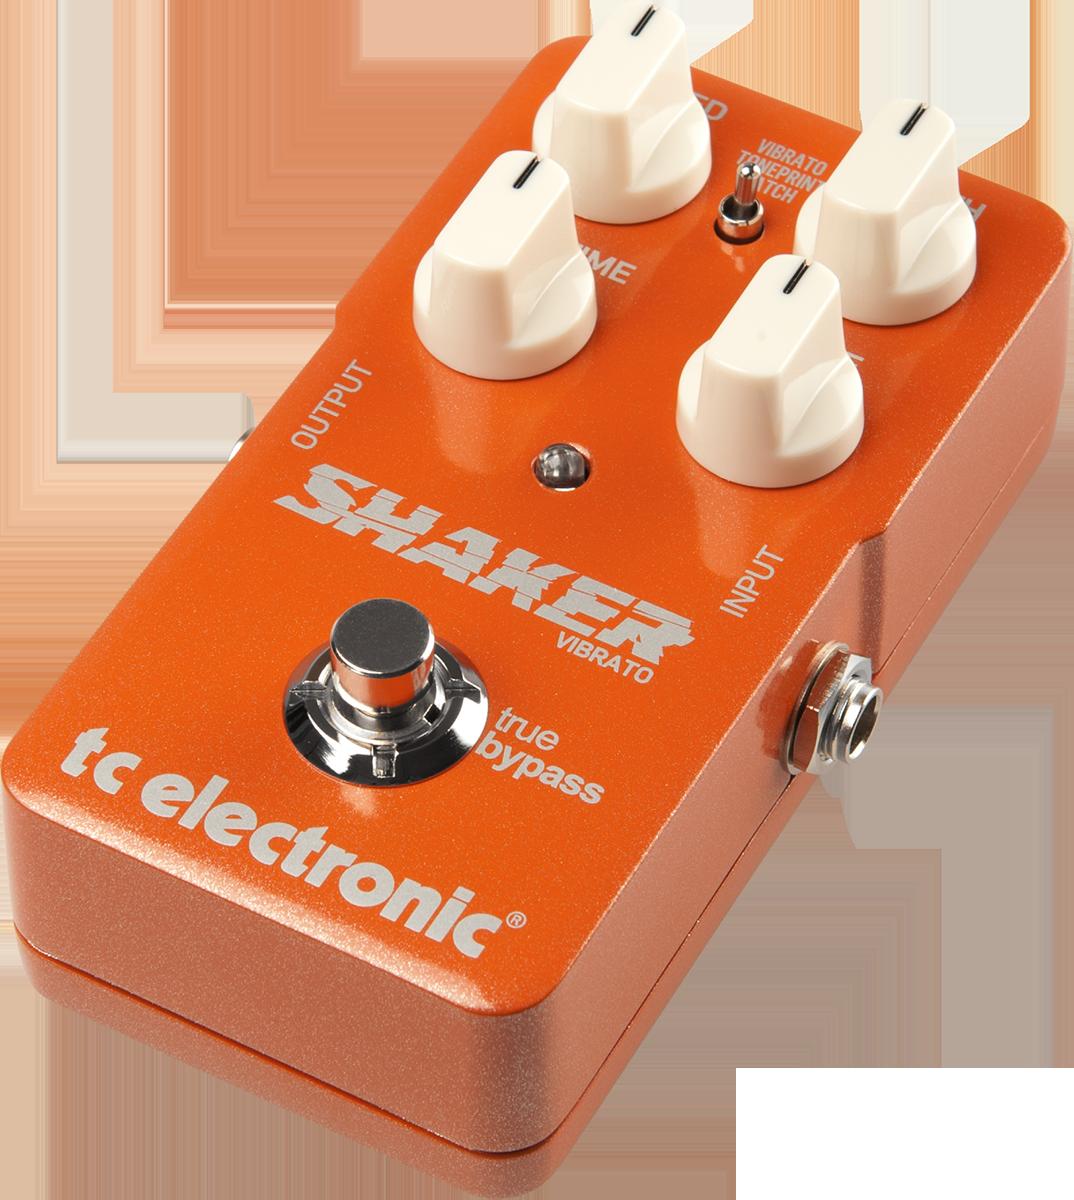 TCElectronic ShakerVibrato guitar-effekt-pedal